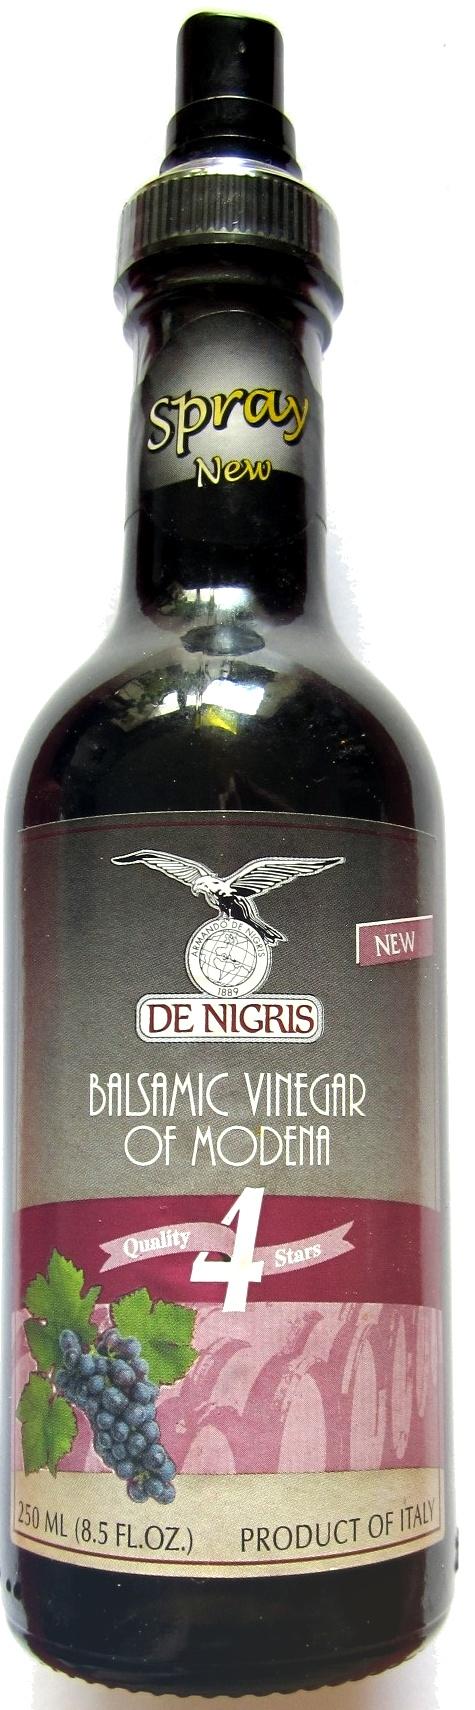 Balsamic vinegar of Modena, spray - Product